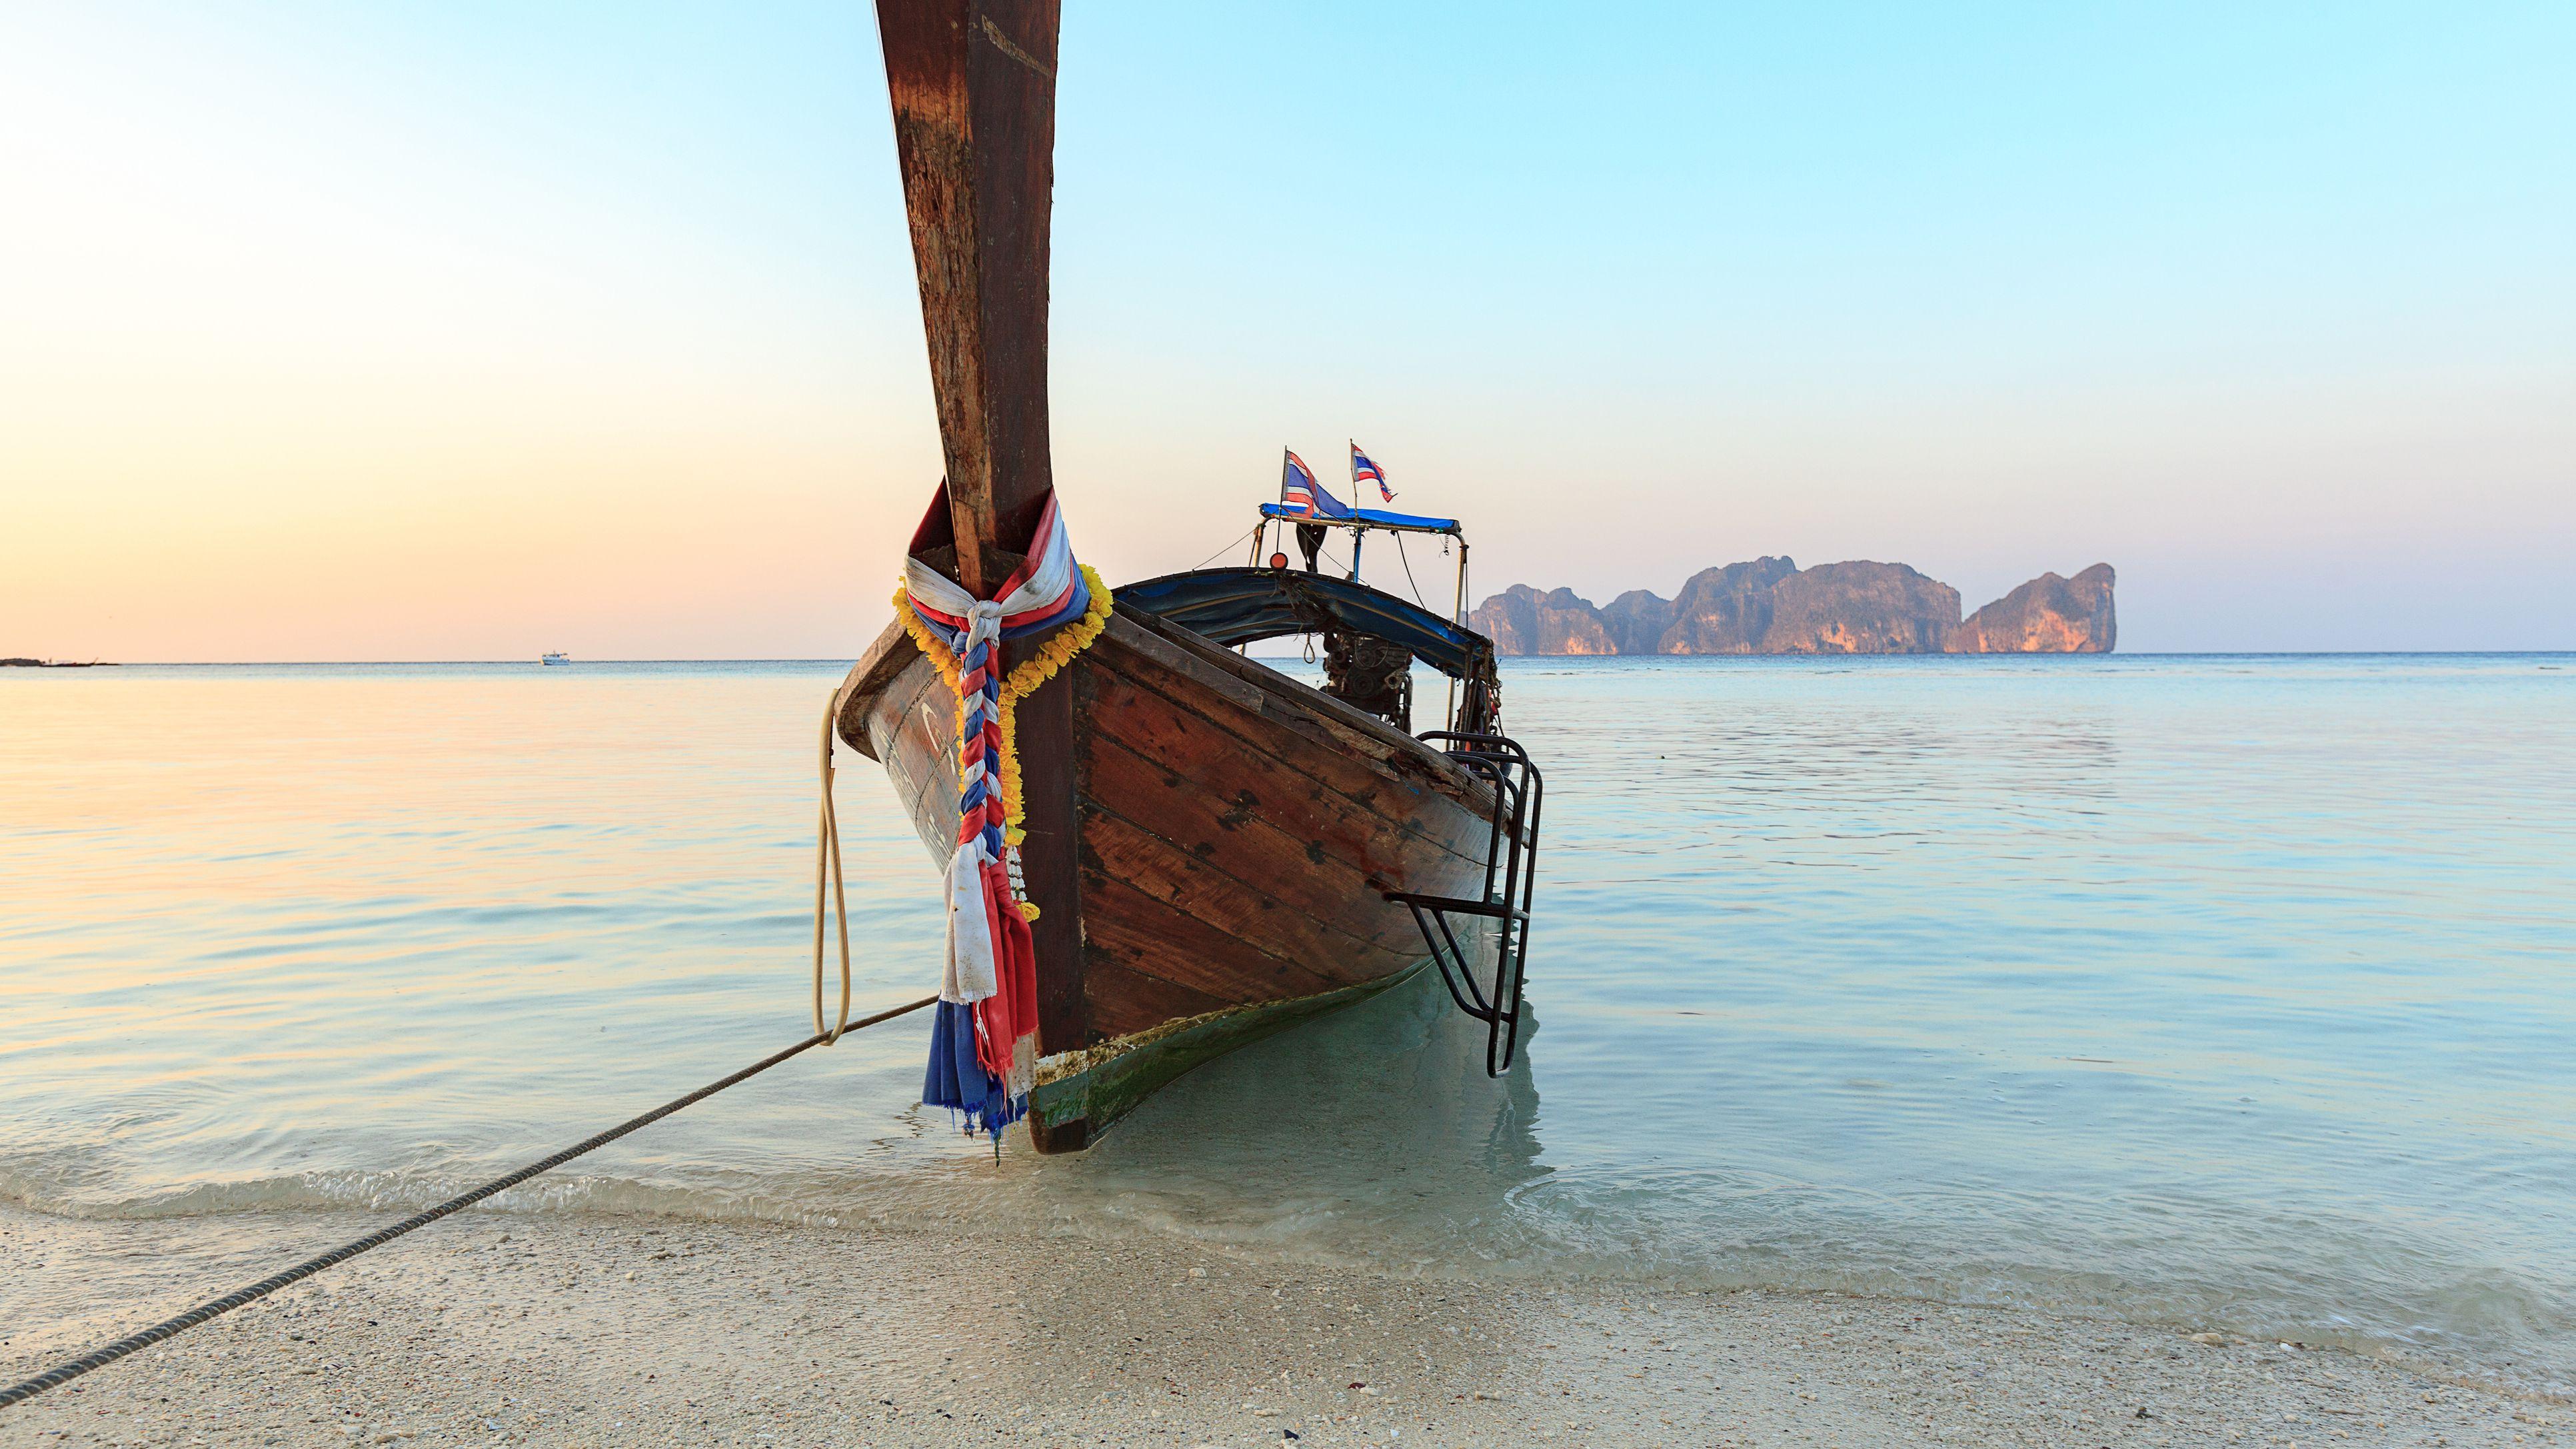 Top 10 Tourist Destinations In Asia